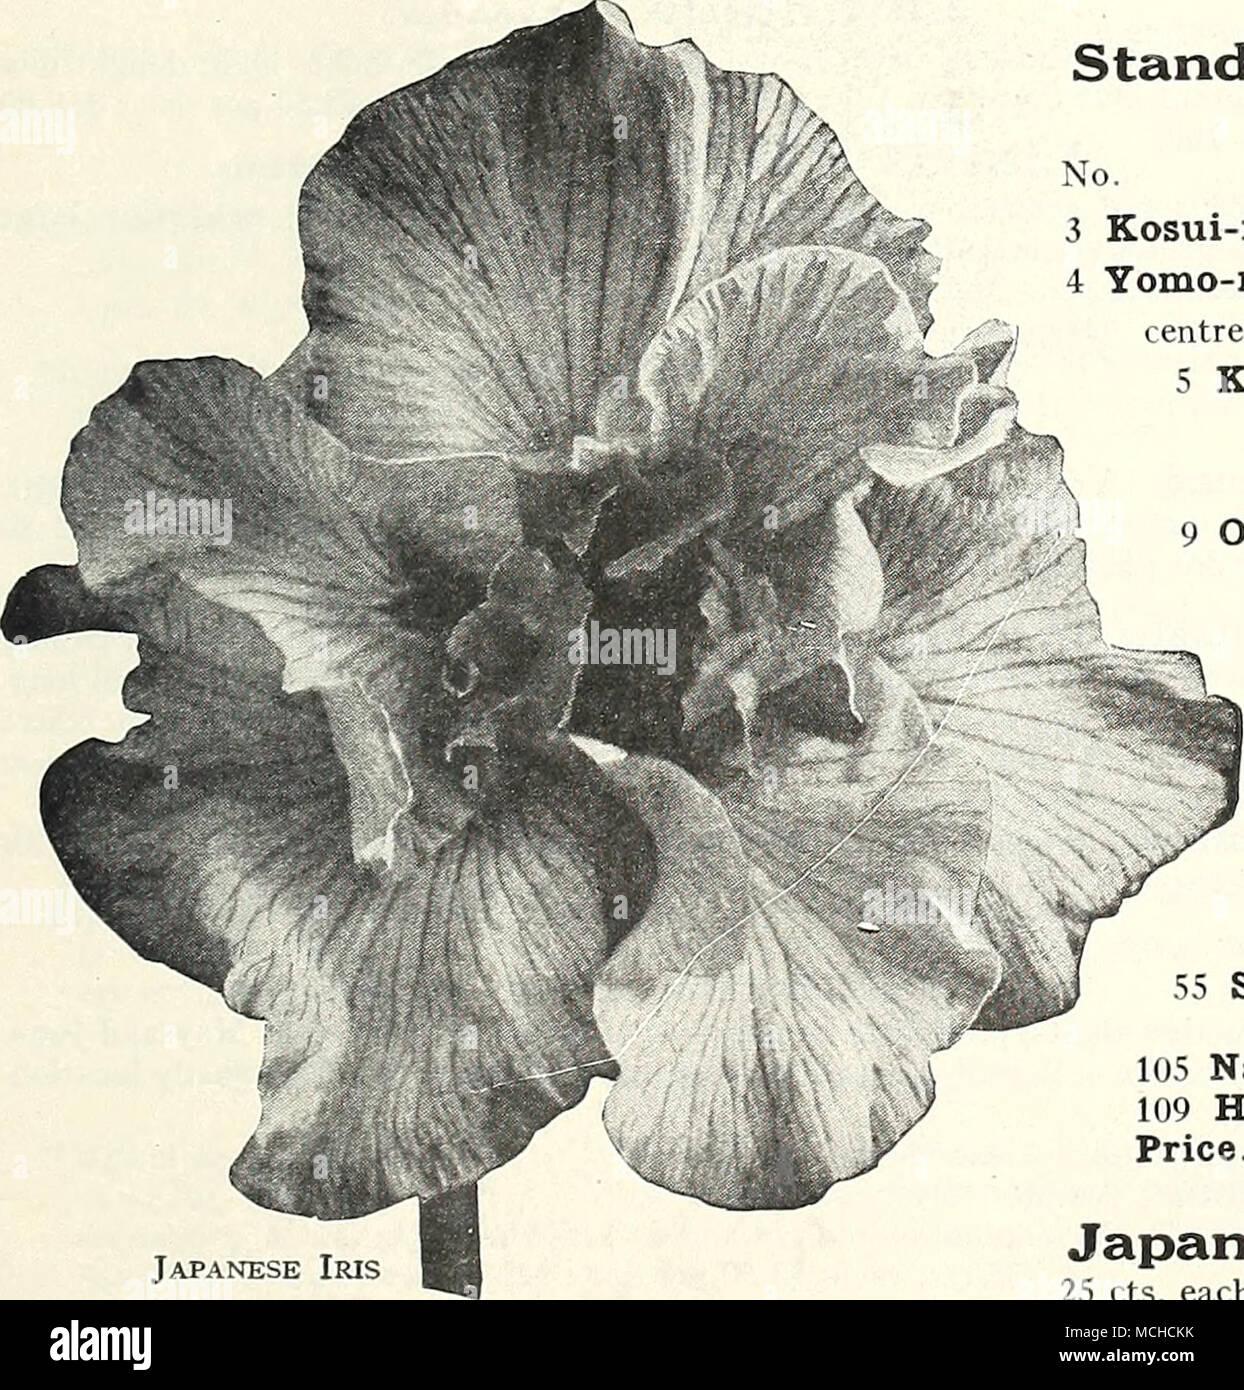 Fothergilla grandi monticola IN VASO 9 cm